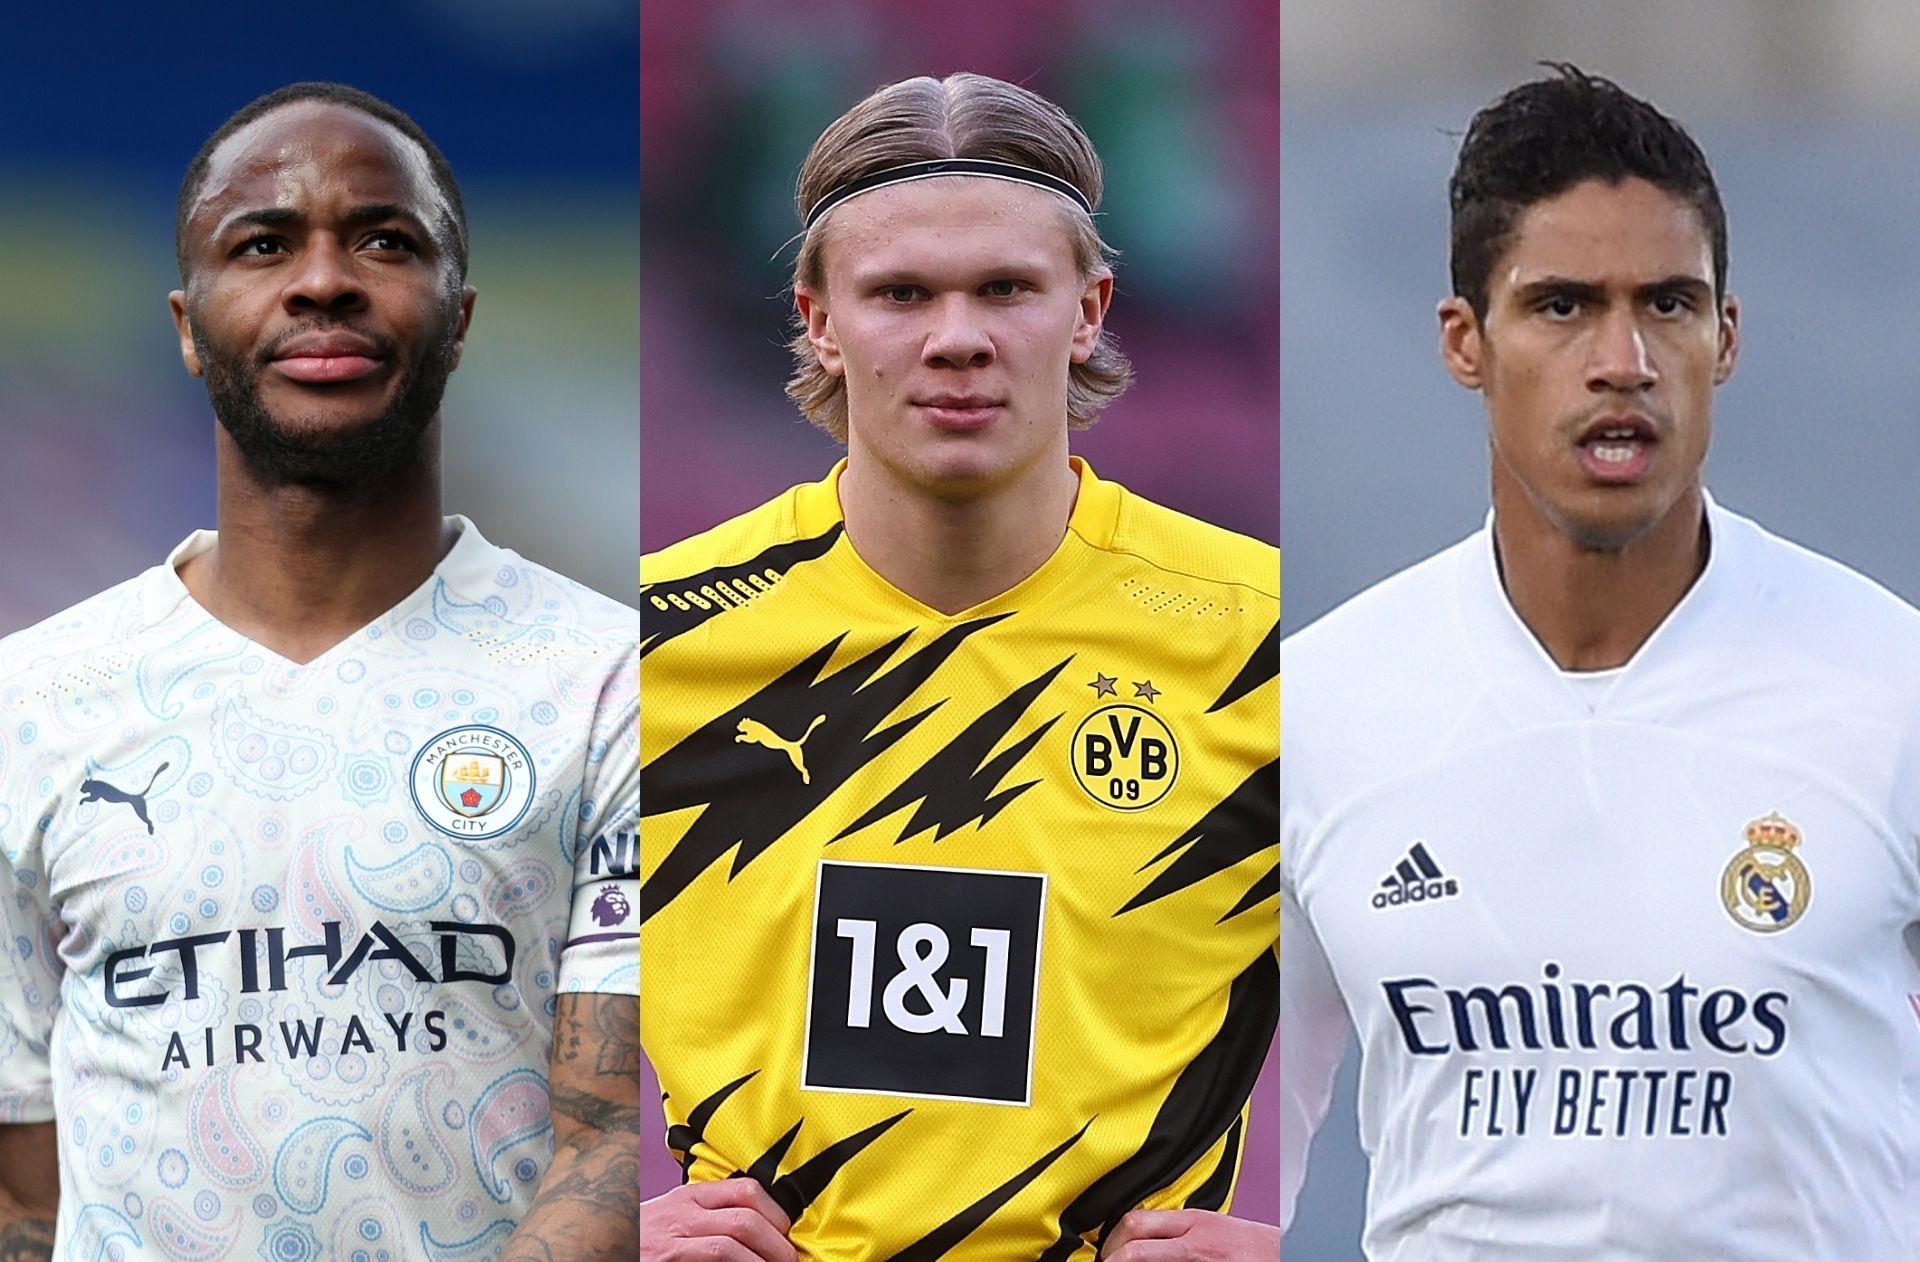 Saturday's transfer rumors - Arsenal plot moves for 2 Man City stars